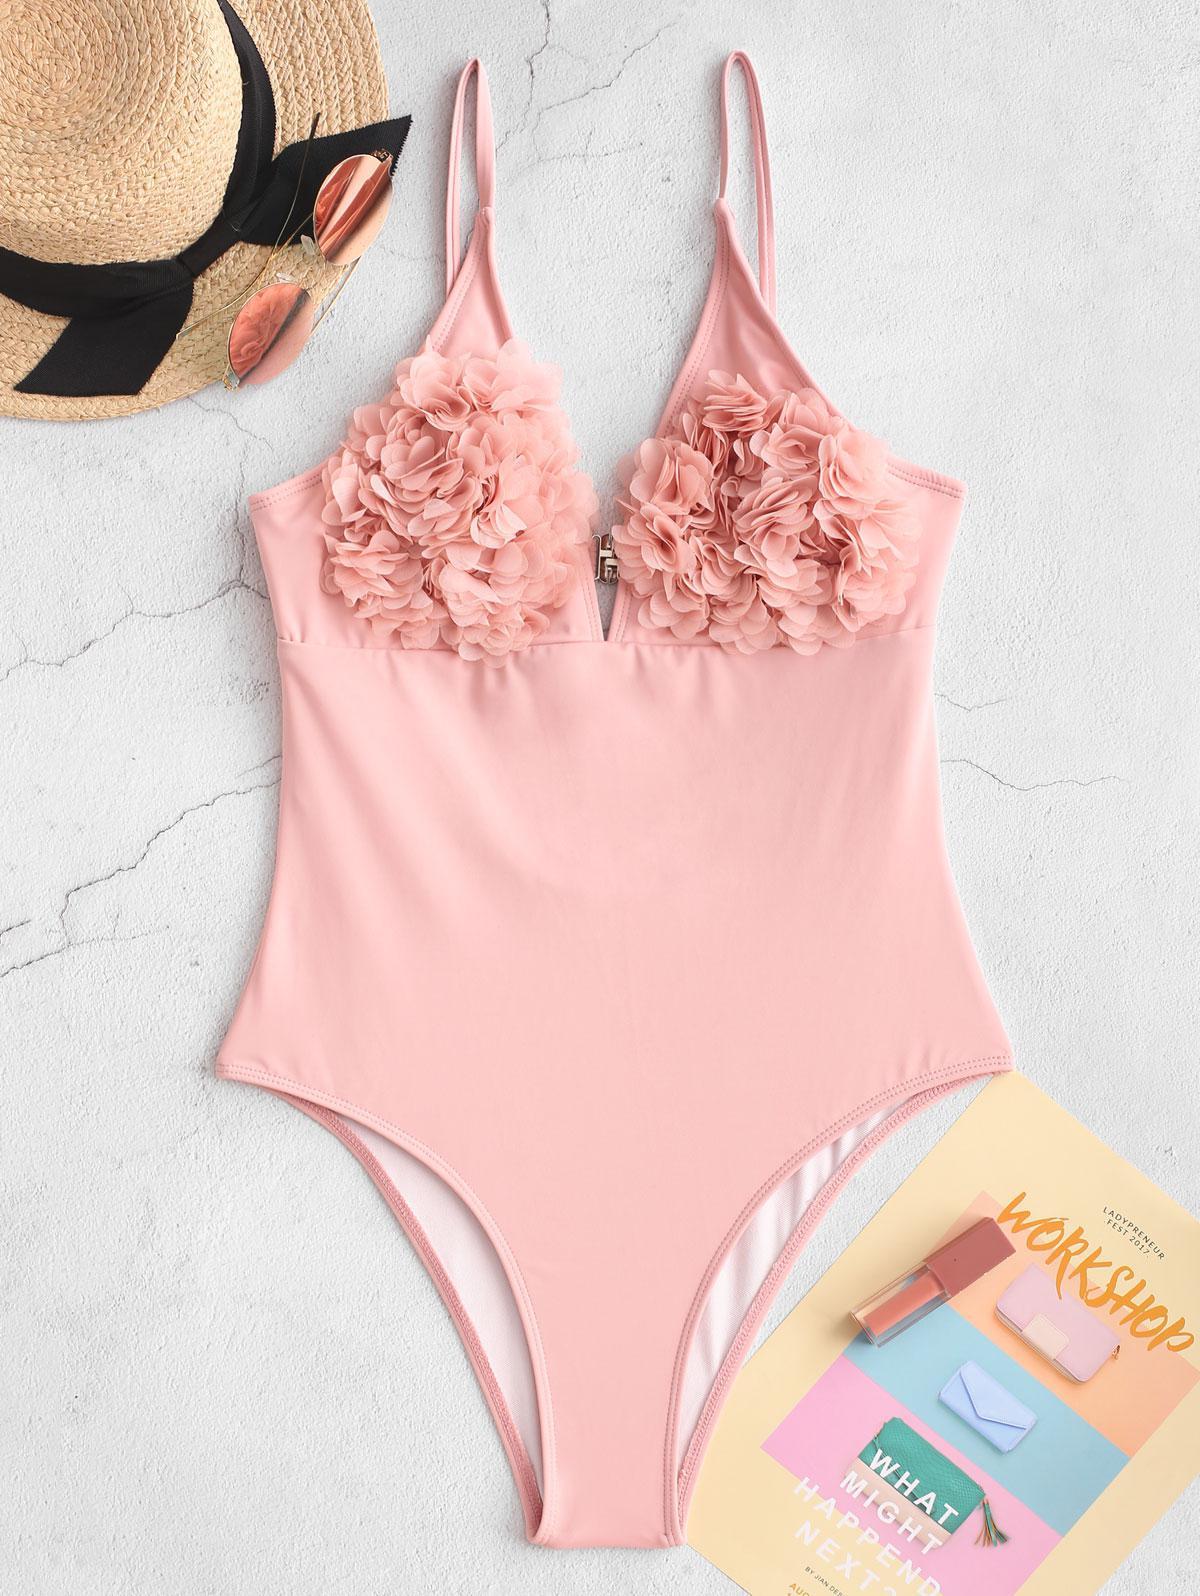 ZAFUL Petal Backless High Cut Bralette One-piece Swimsuit thumbnail